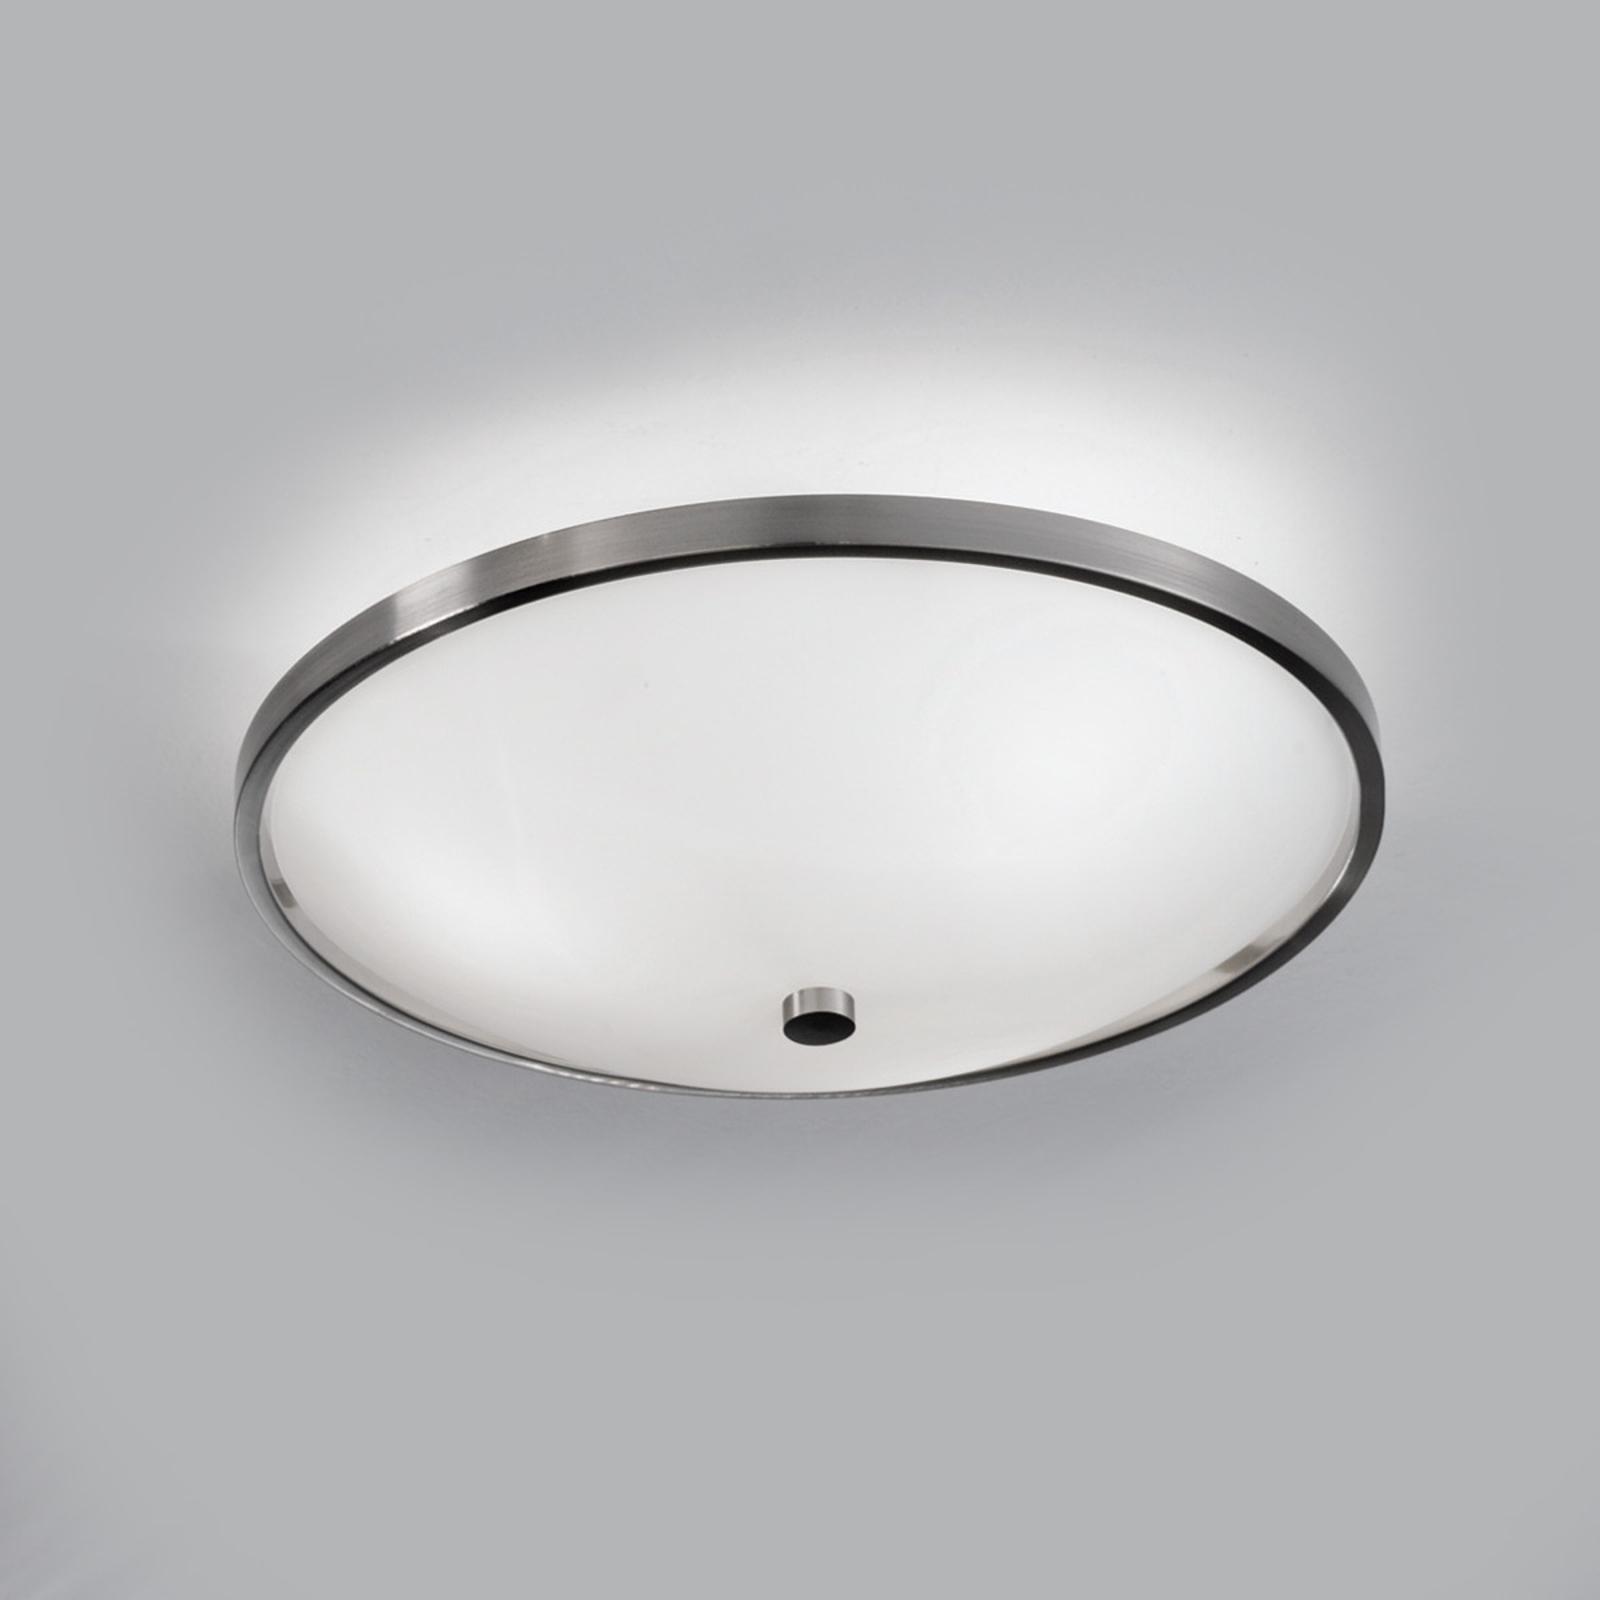 Fleksibel Samira taklampe 39,5 cm